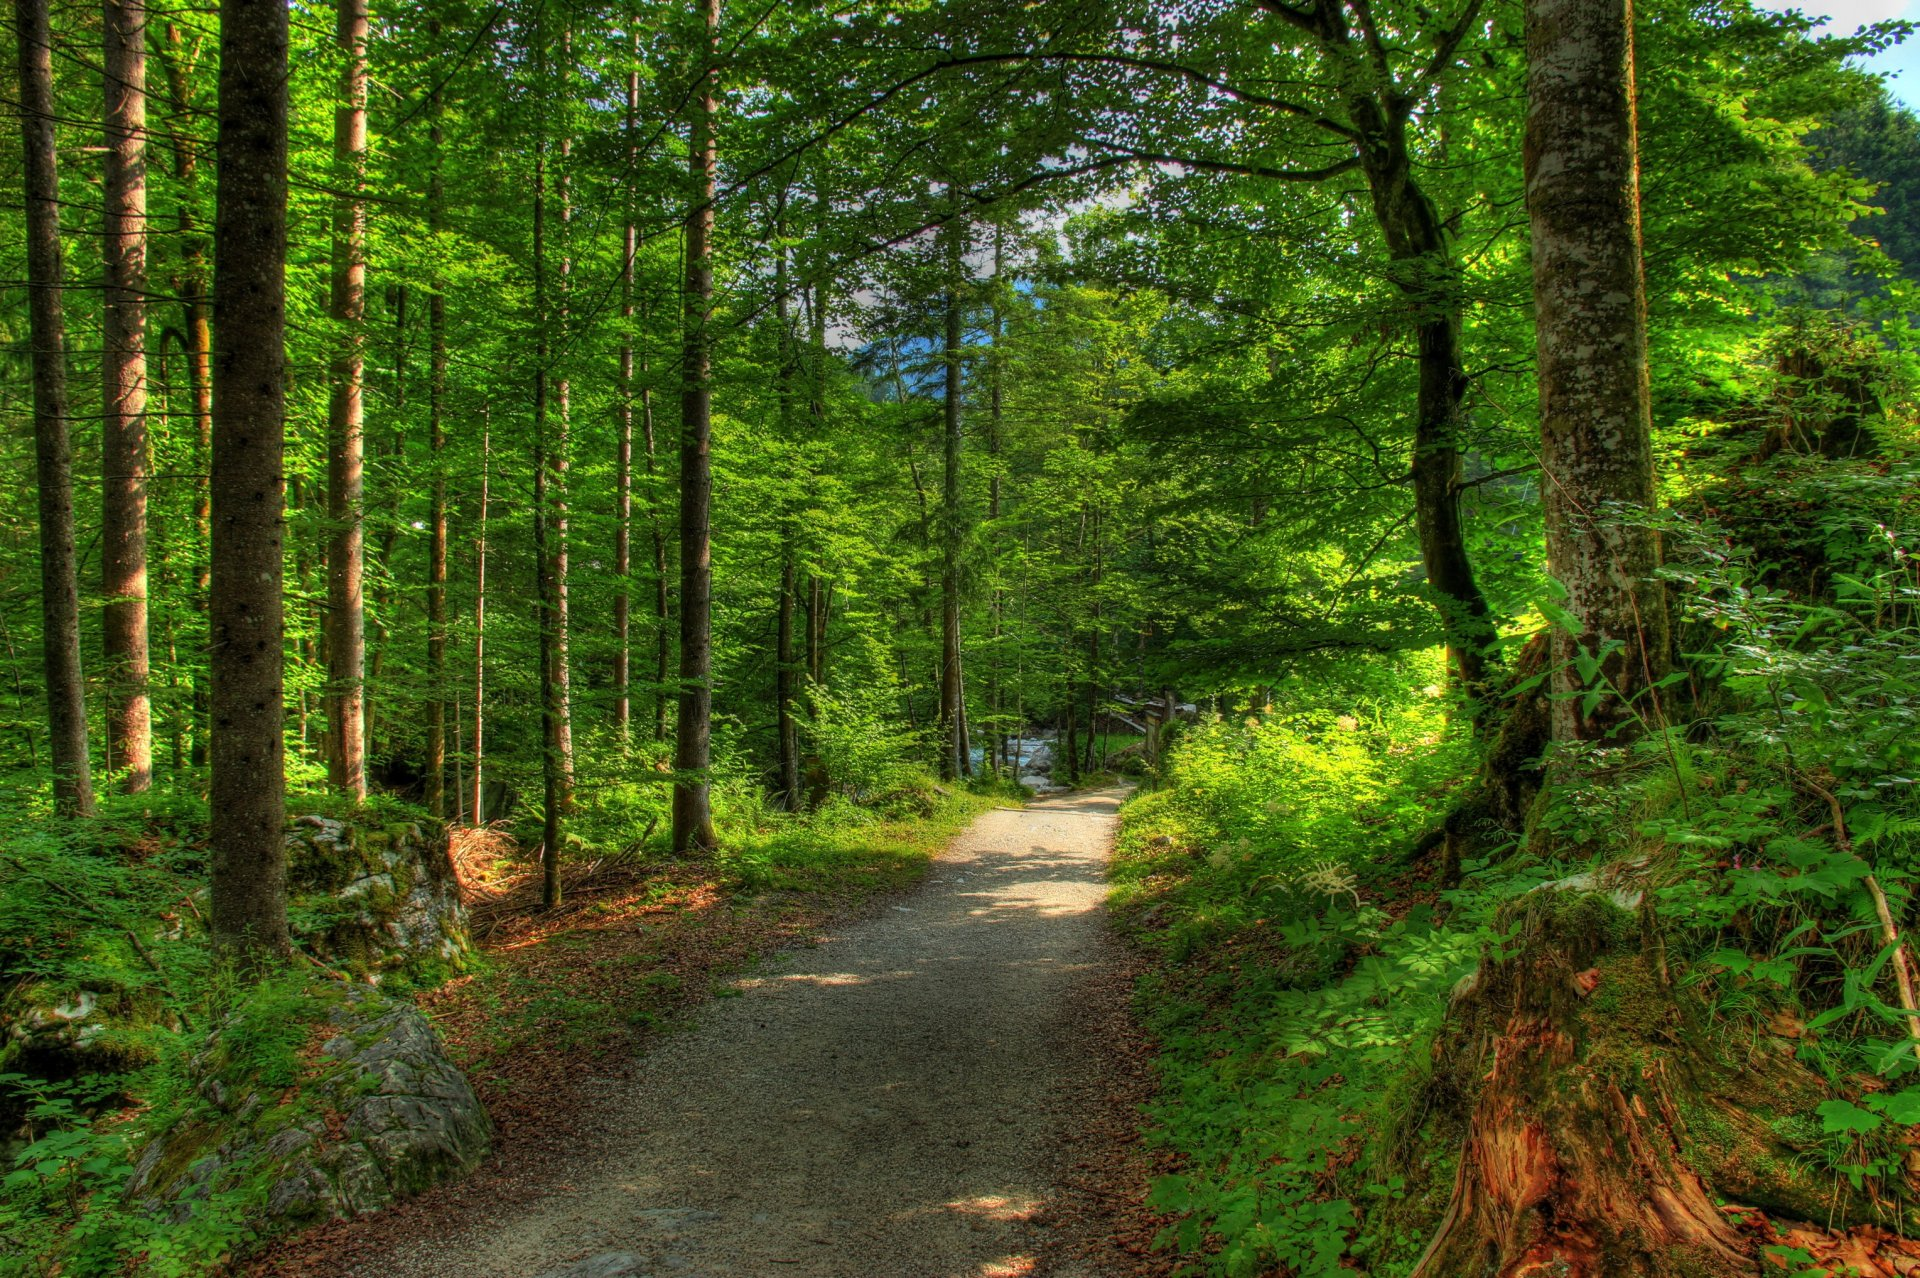 Картинка леса из германии